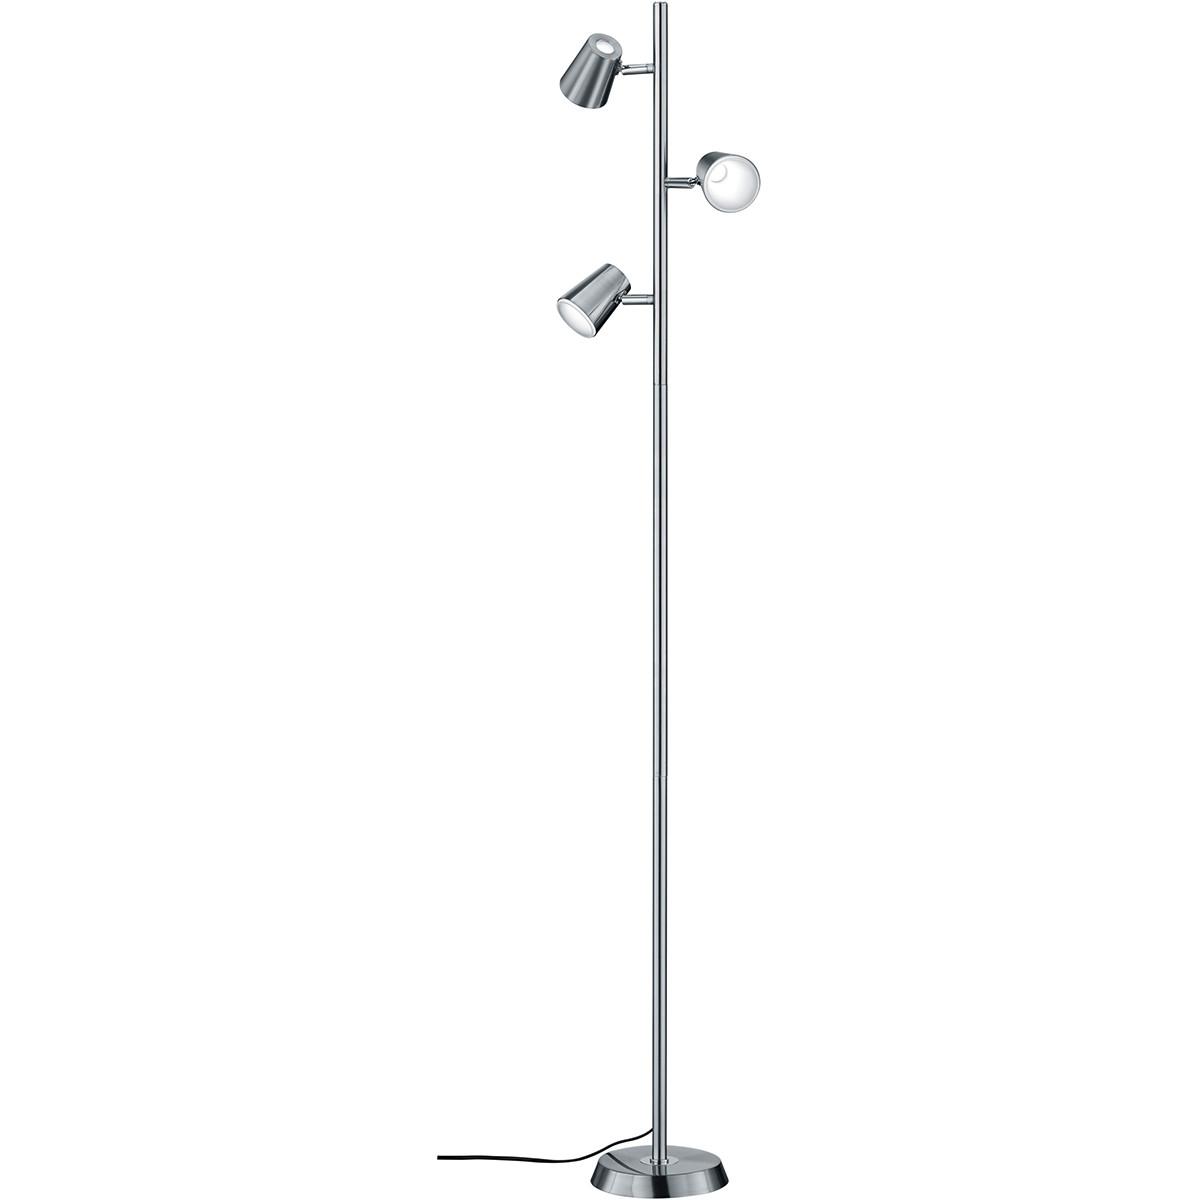 LED Vloerlamp - Trion Narca - 12W - Warm Wit 3000K - 3-lichts - Dimbaar - Rond - Mat Nikkel - Alumin